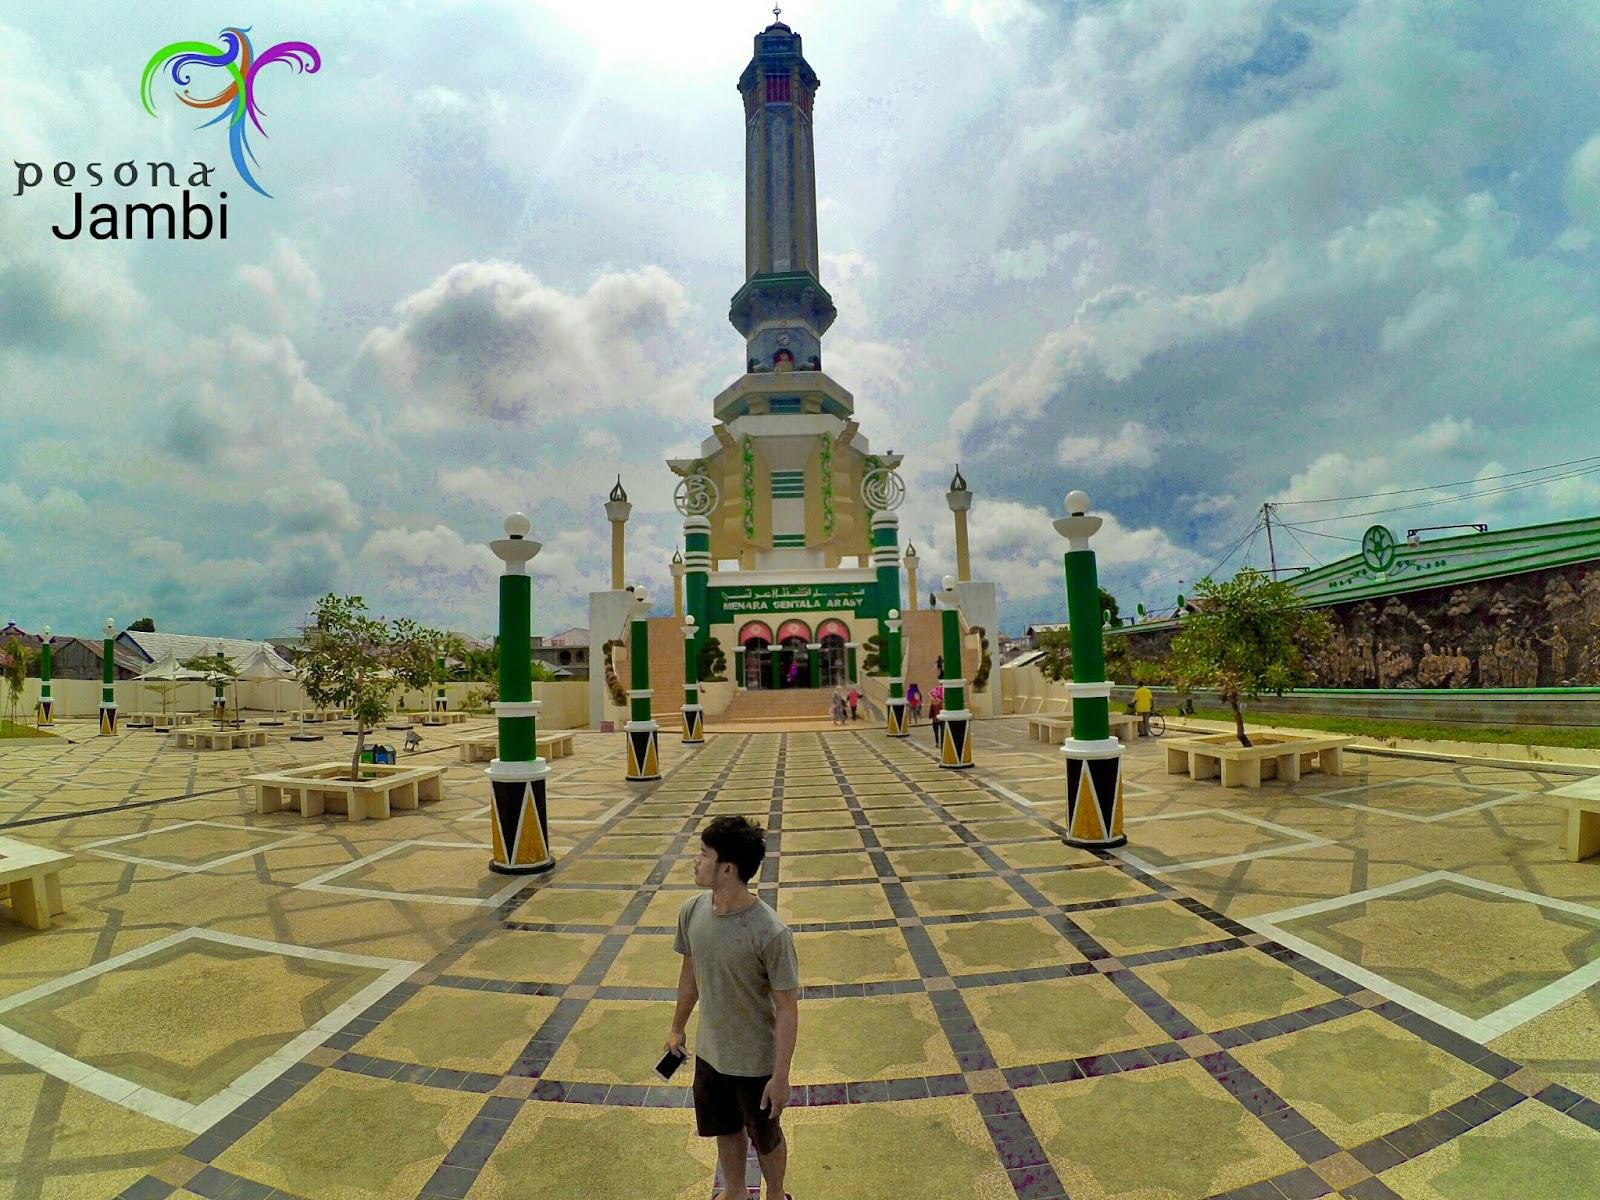 Pesona Jambi Menara Gentala Arasy Kota